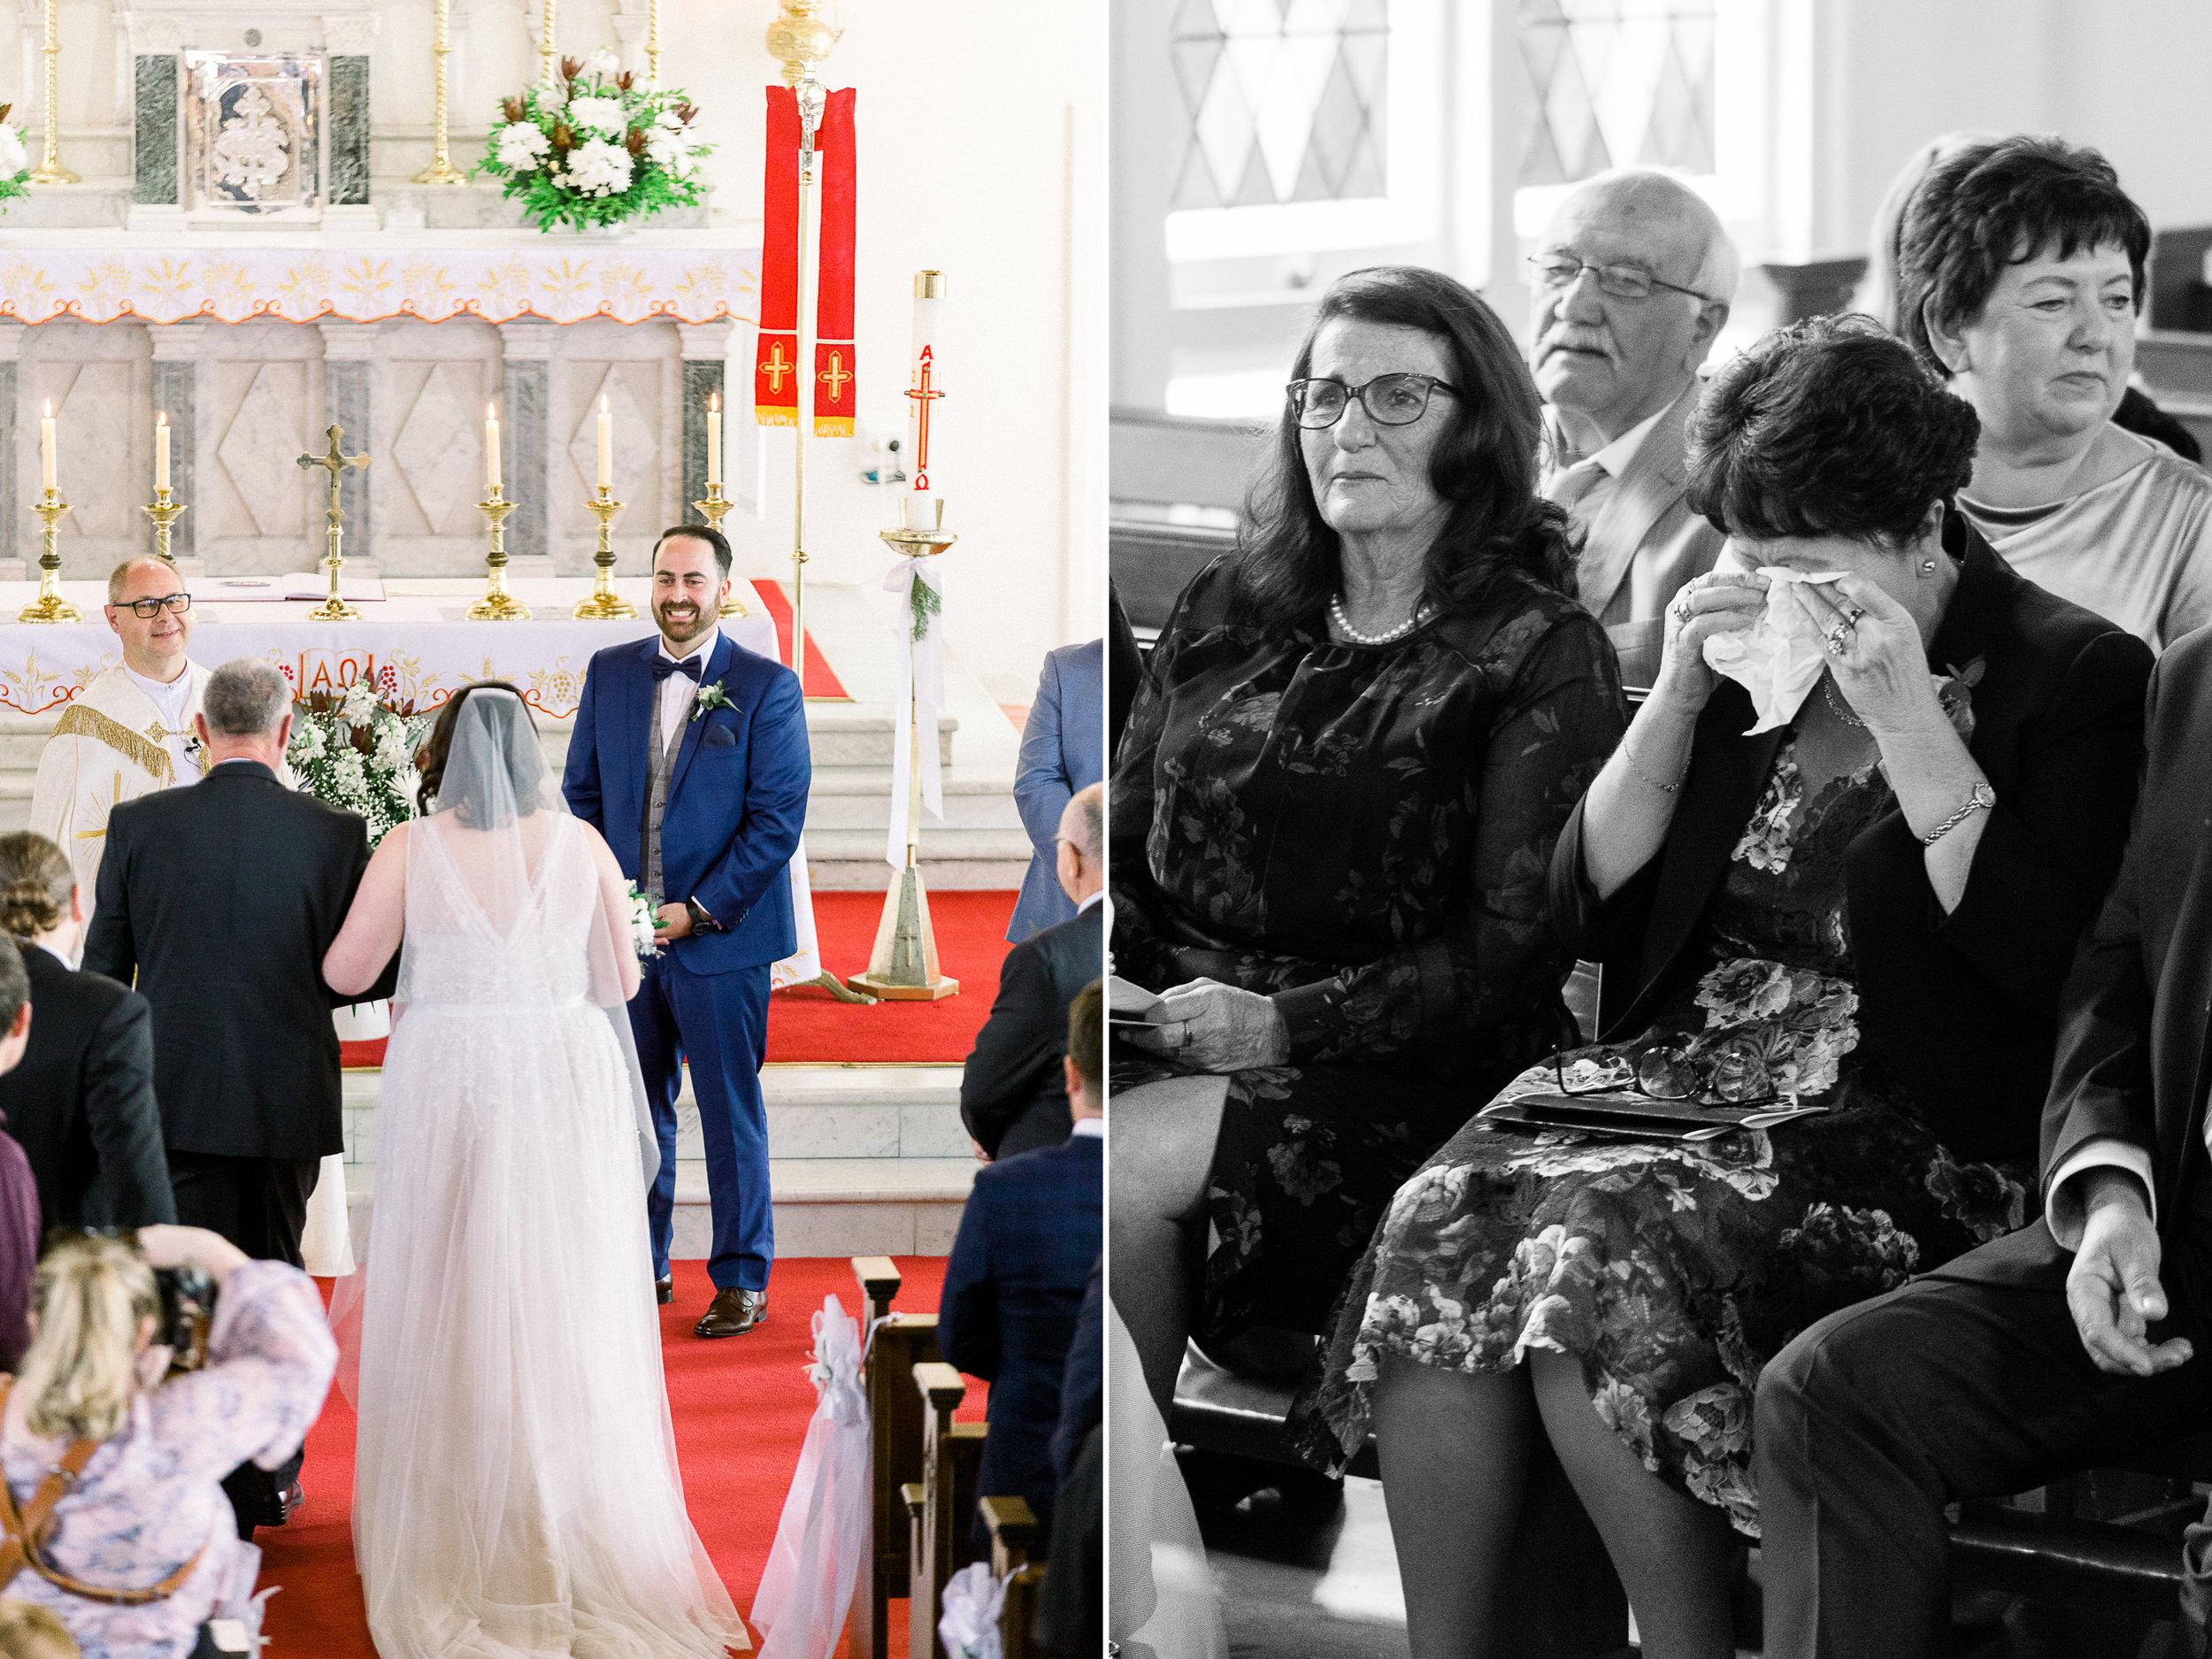 brisbane-city-wedding-church-ceremony-wedding-3.jpg